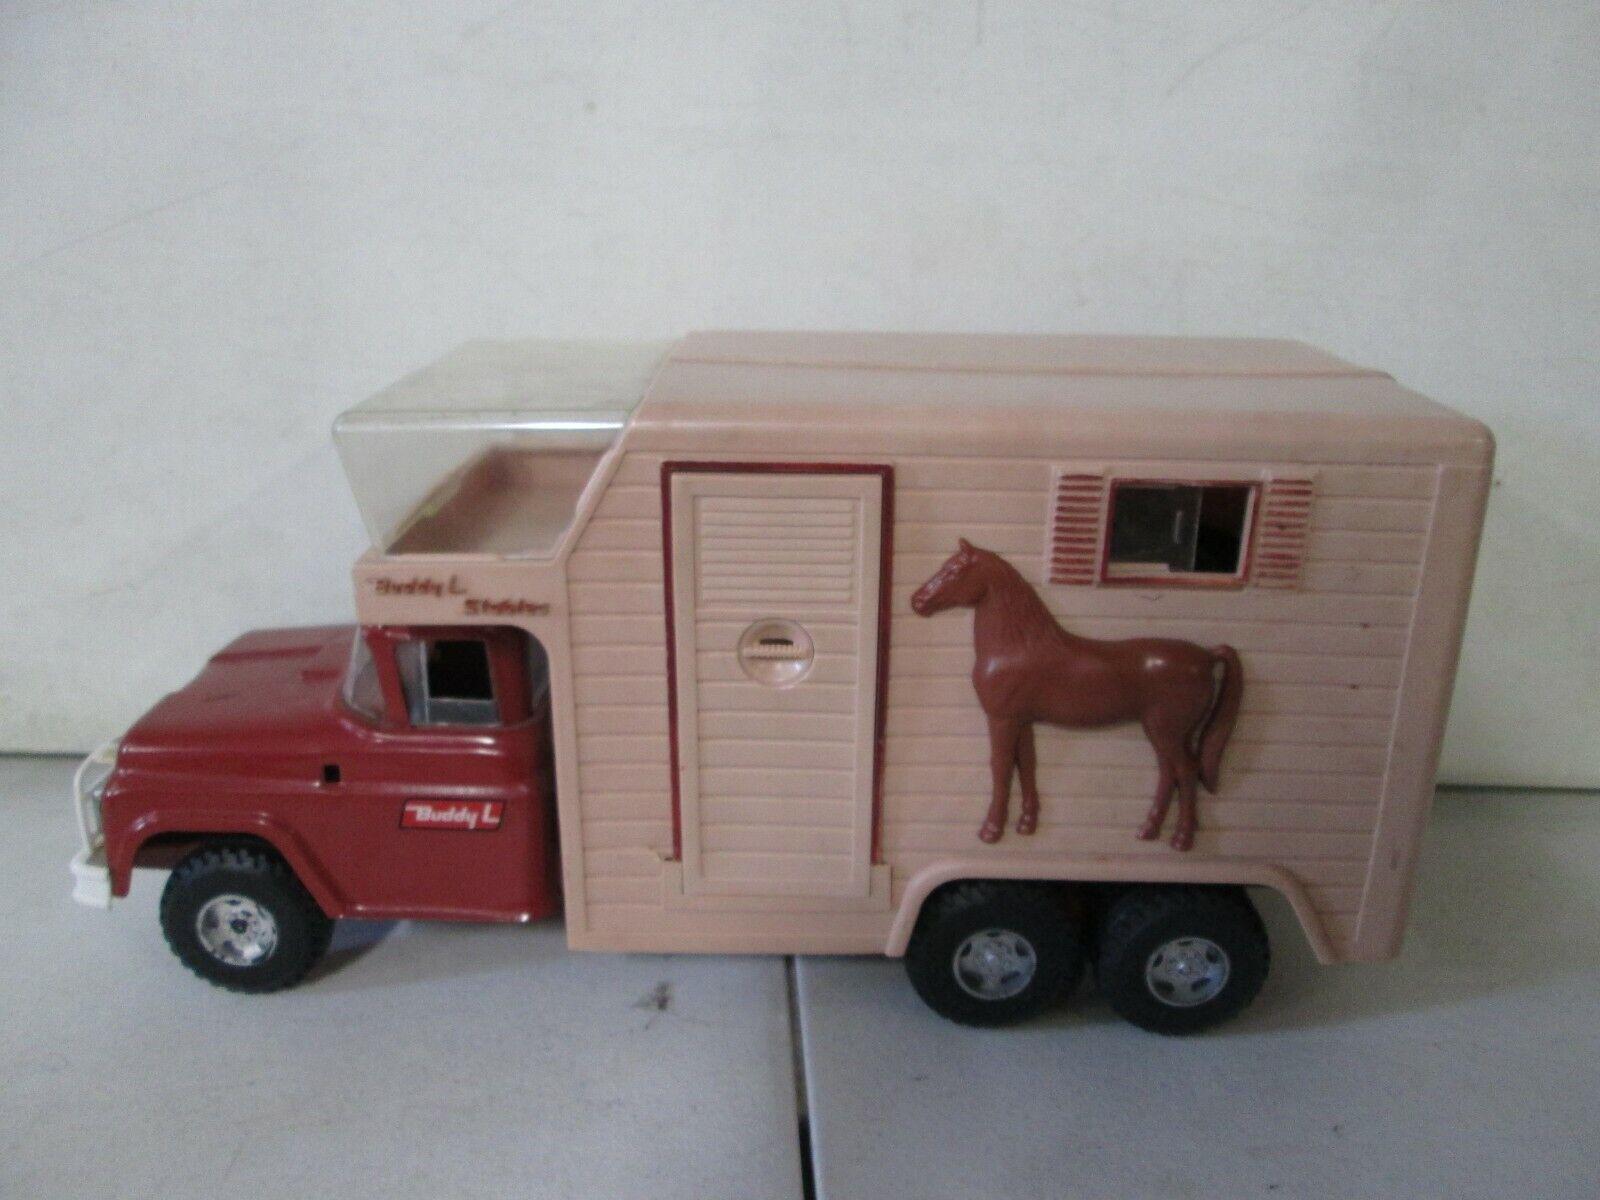 Buddy L Horse Truck w  Horses